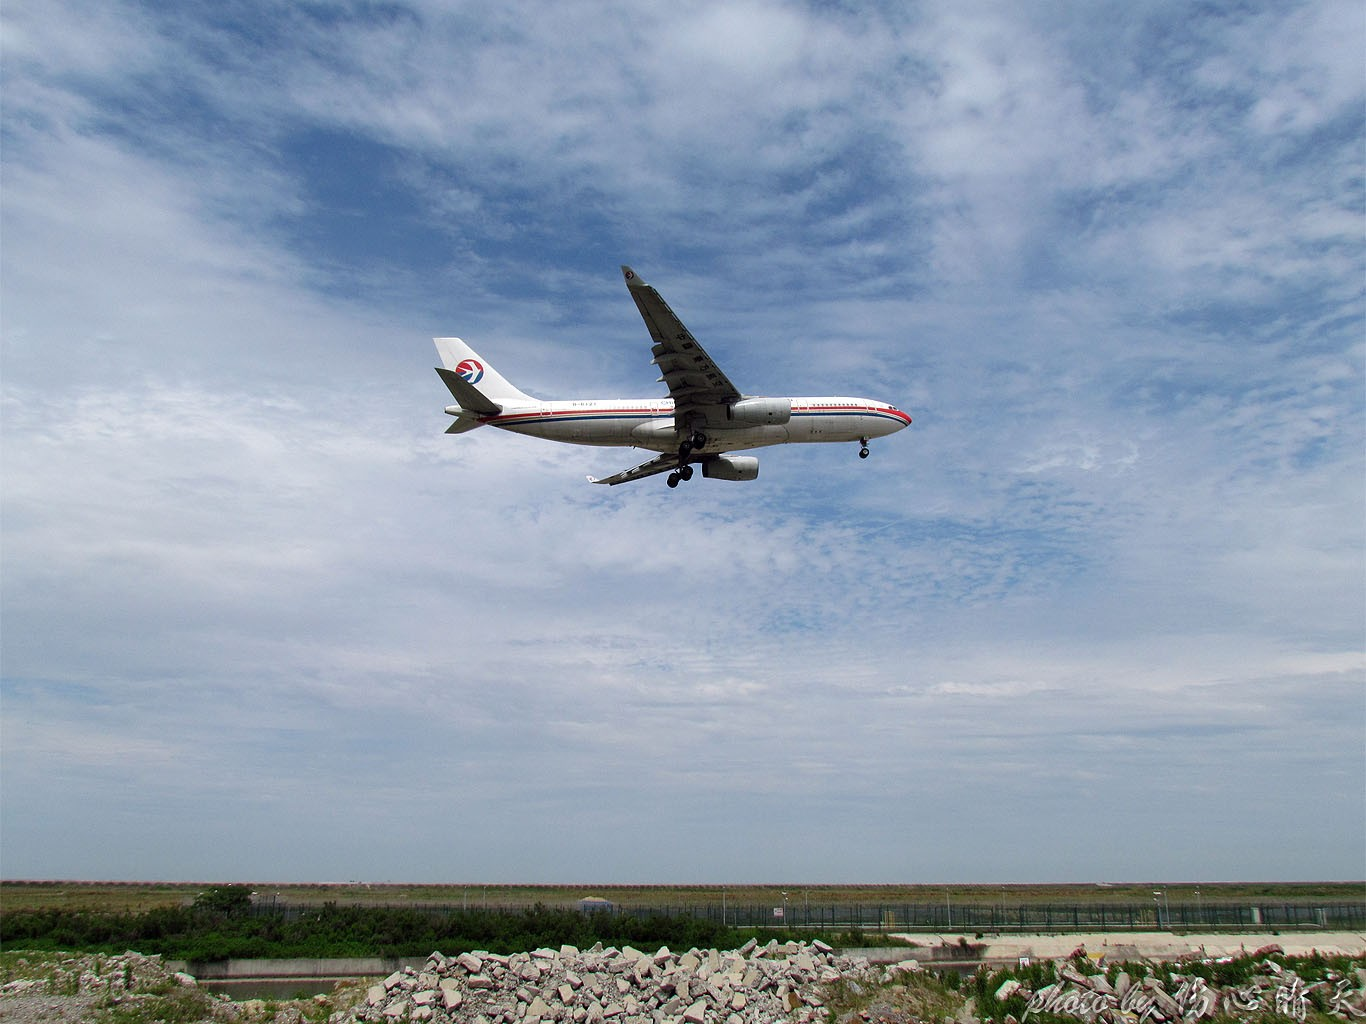 Re:[原创]PVG联盟彩绘的一天!地主、越南、AA、QF、大韩……就差星空了! AIRBUS A330-200 B-6121 中国上海浦东国际机场